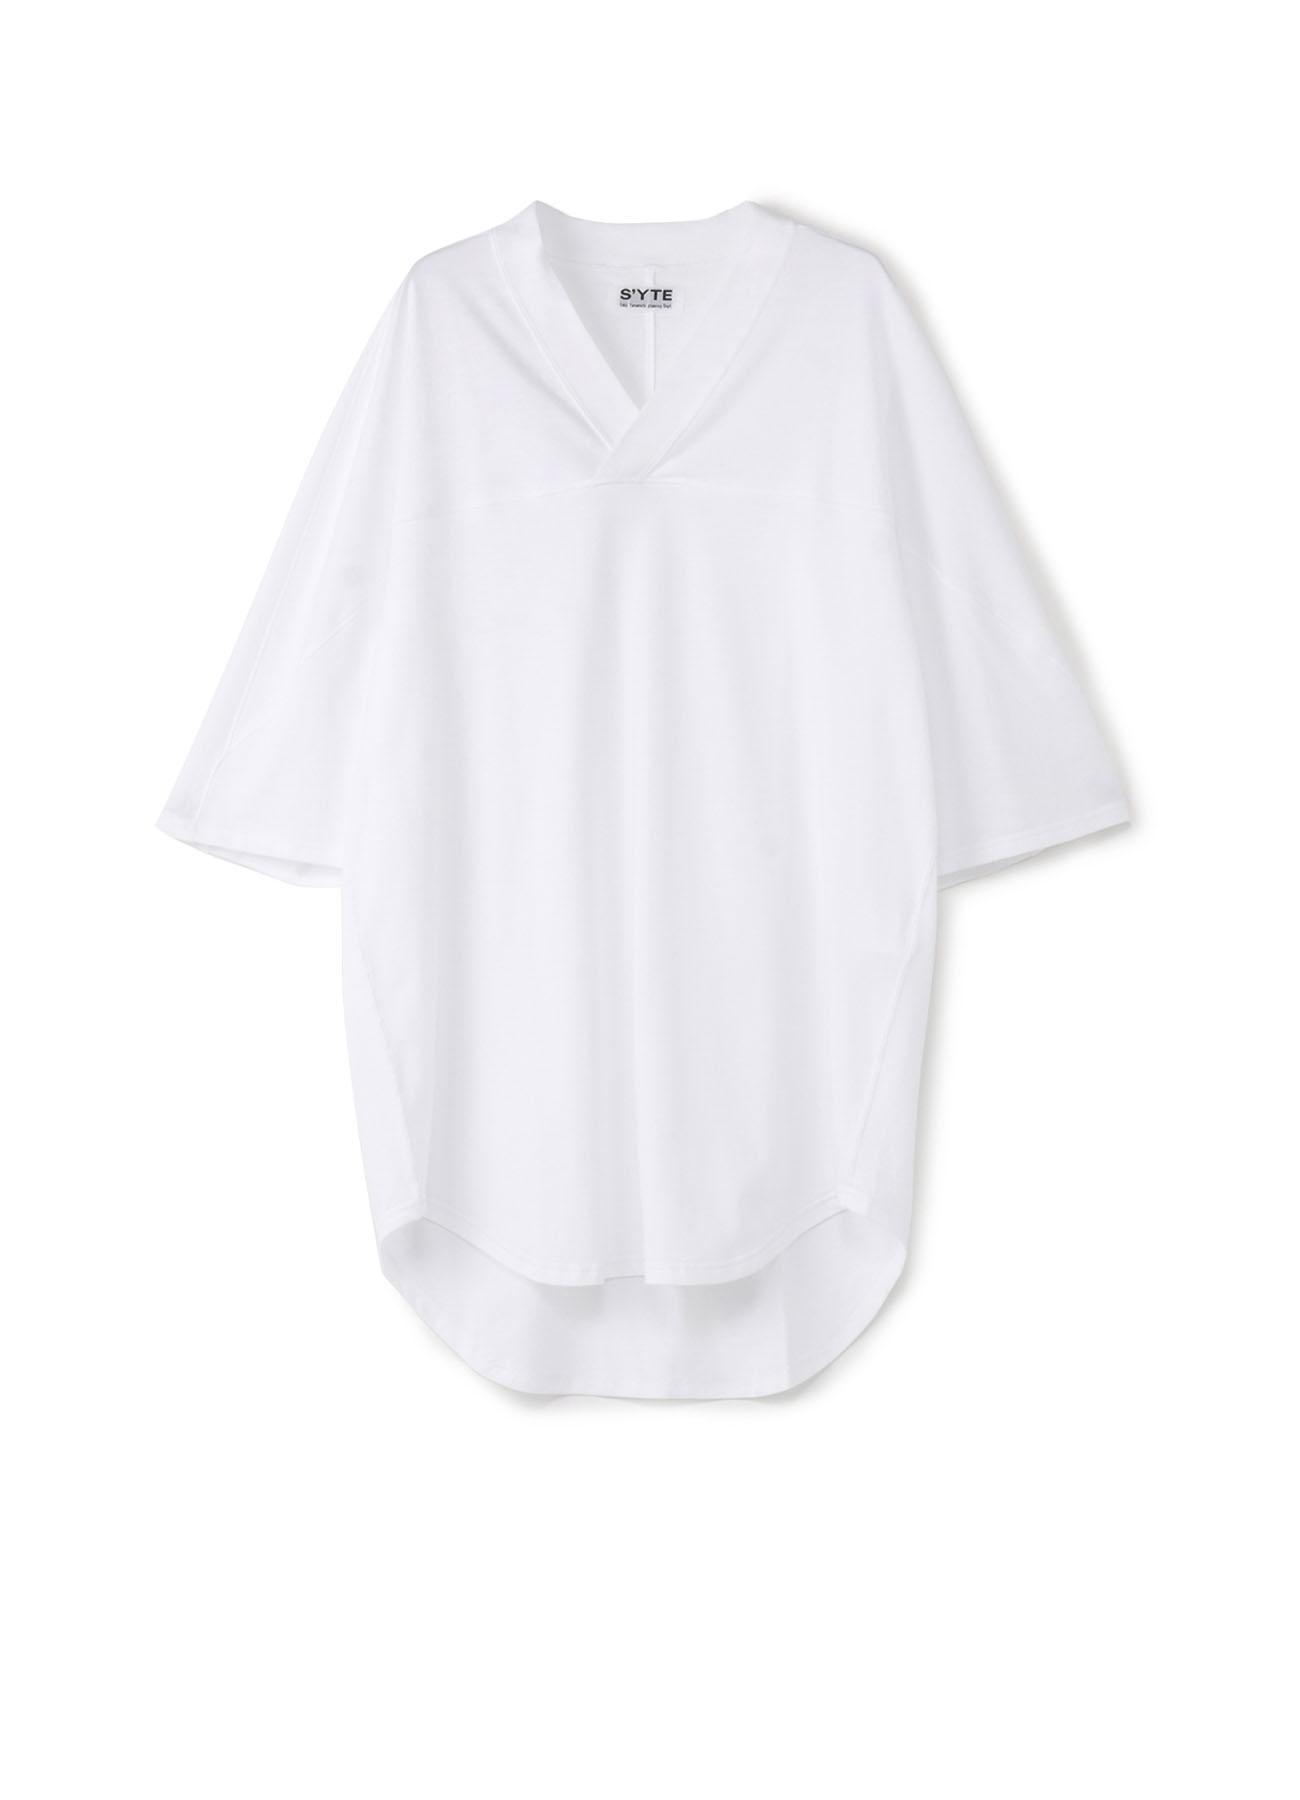 40/2Cotton Jersey Football V-Neck Half Sleeve T-shirt